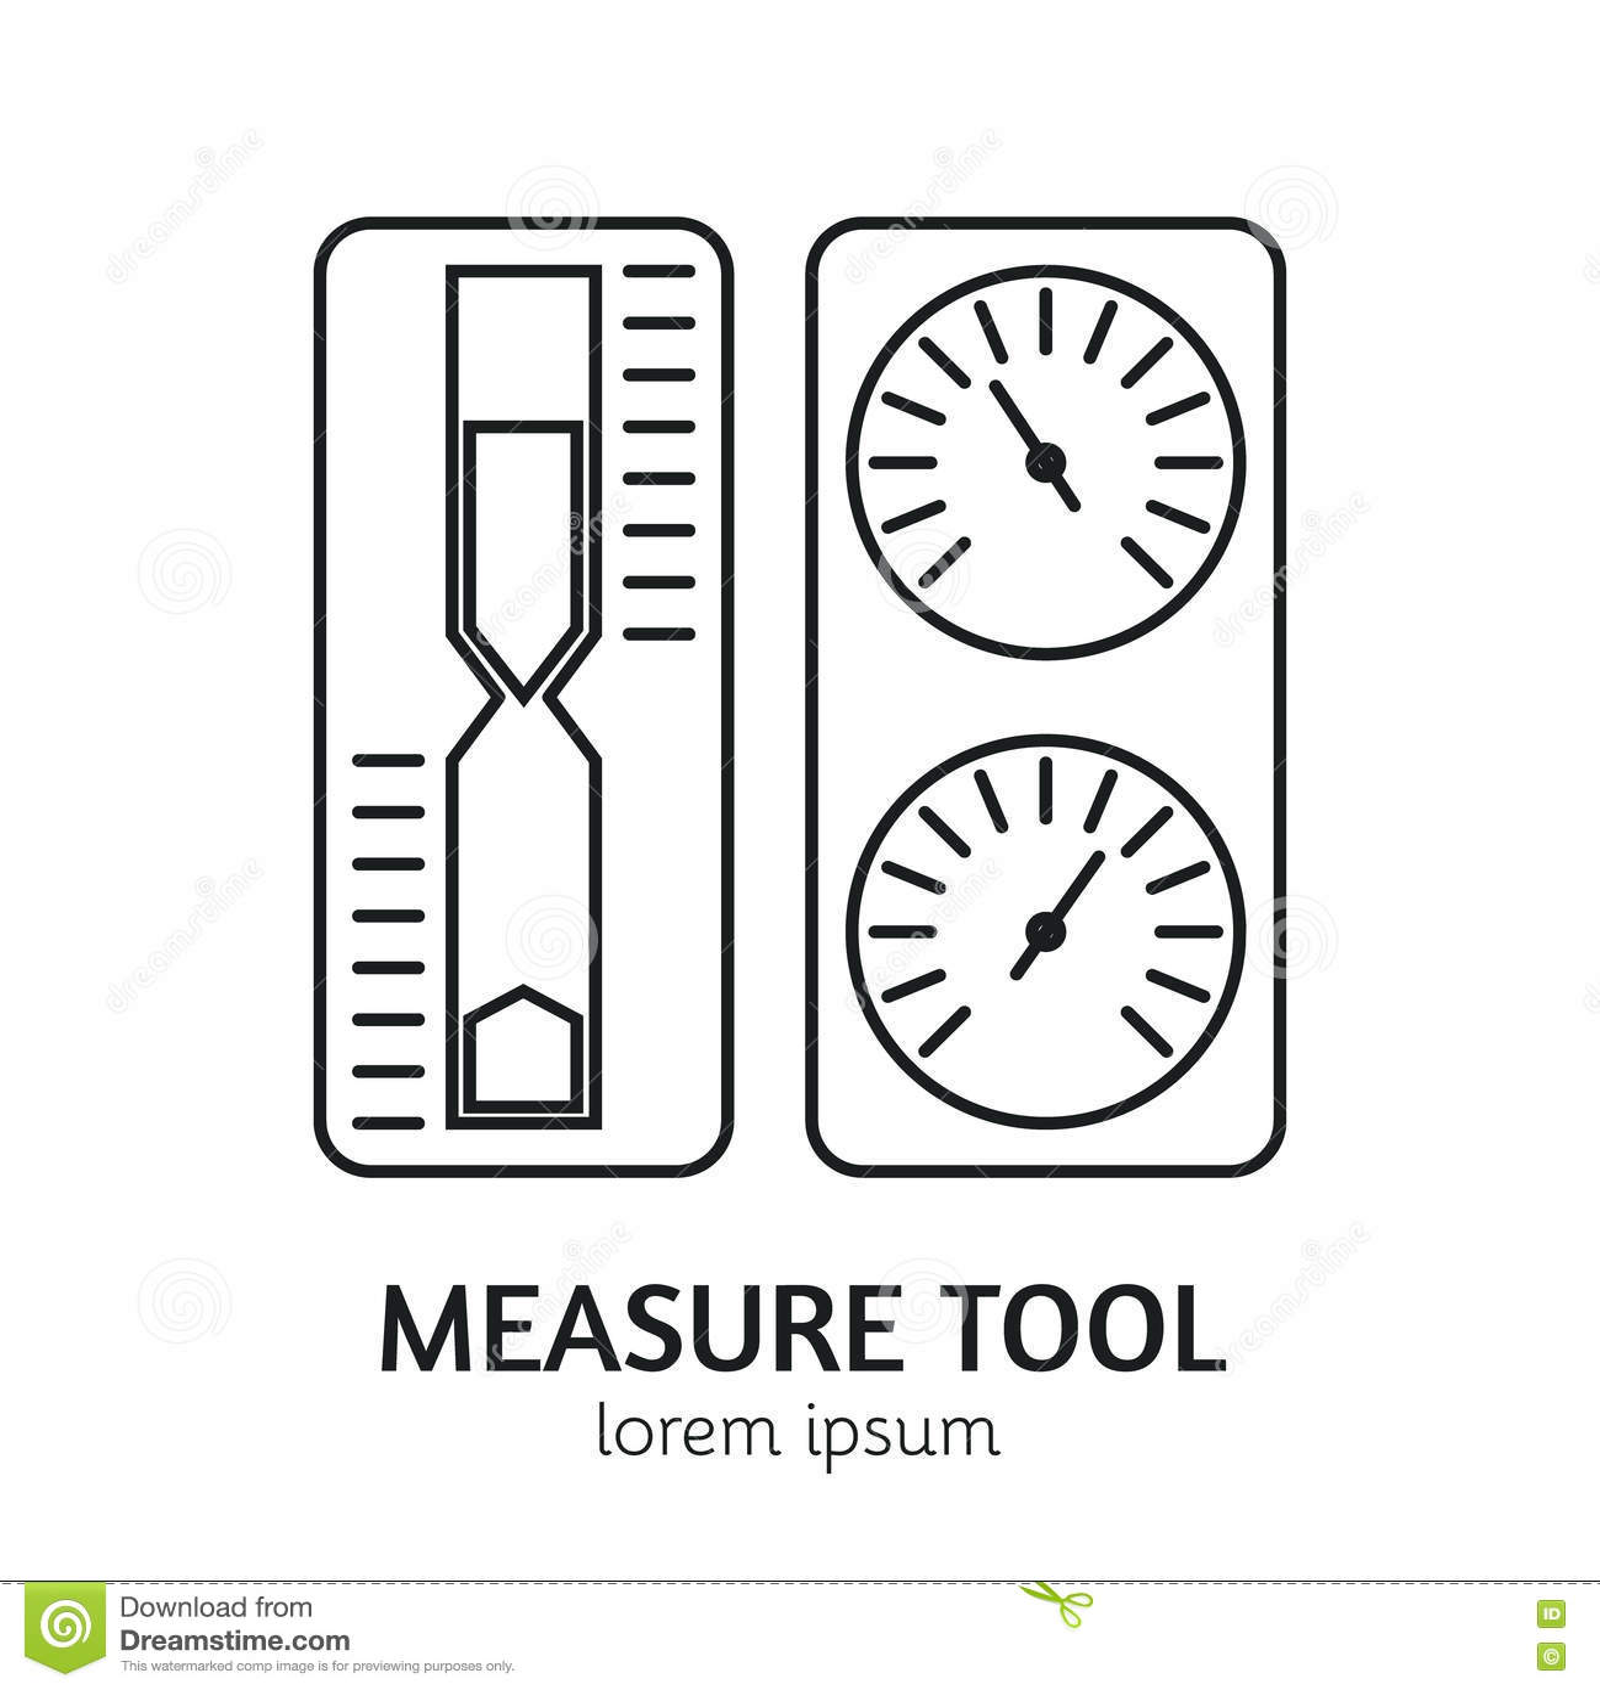 hygrometer cartoons  illustrations  u0026 vector stock images